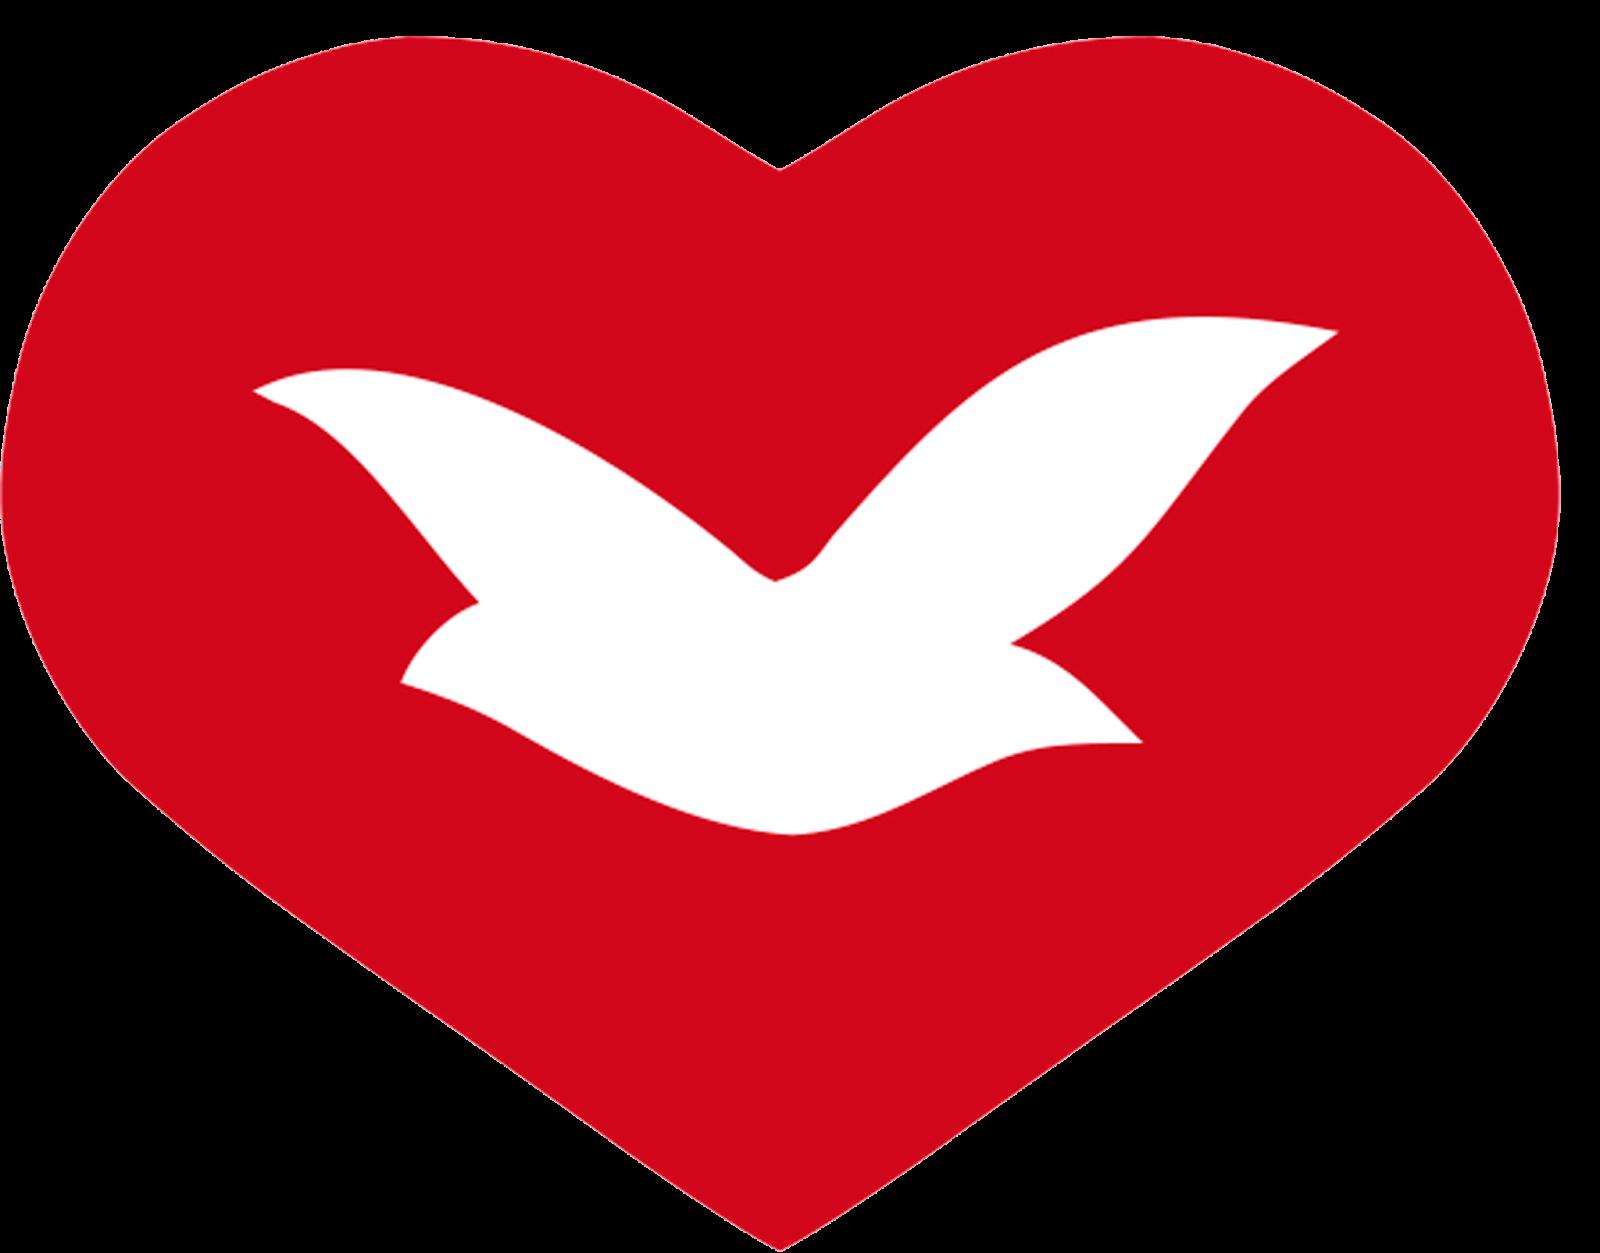 Igreja Universal Logo, Simbolo.